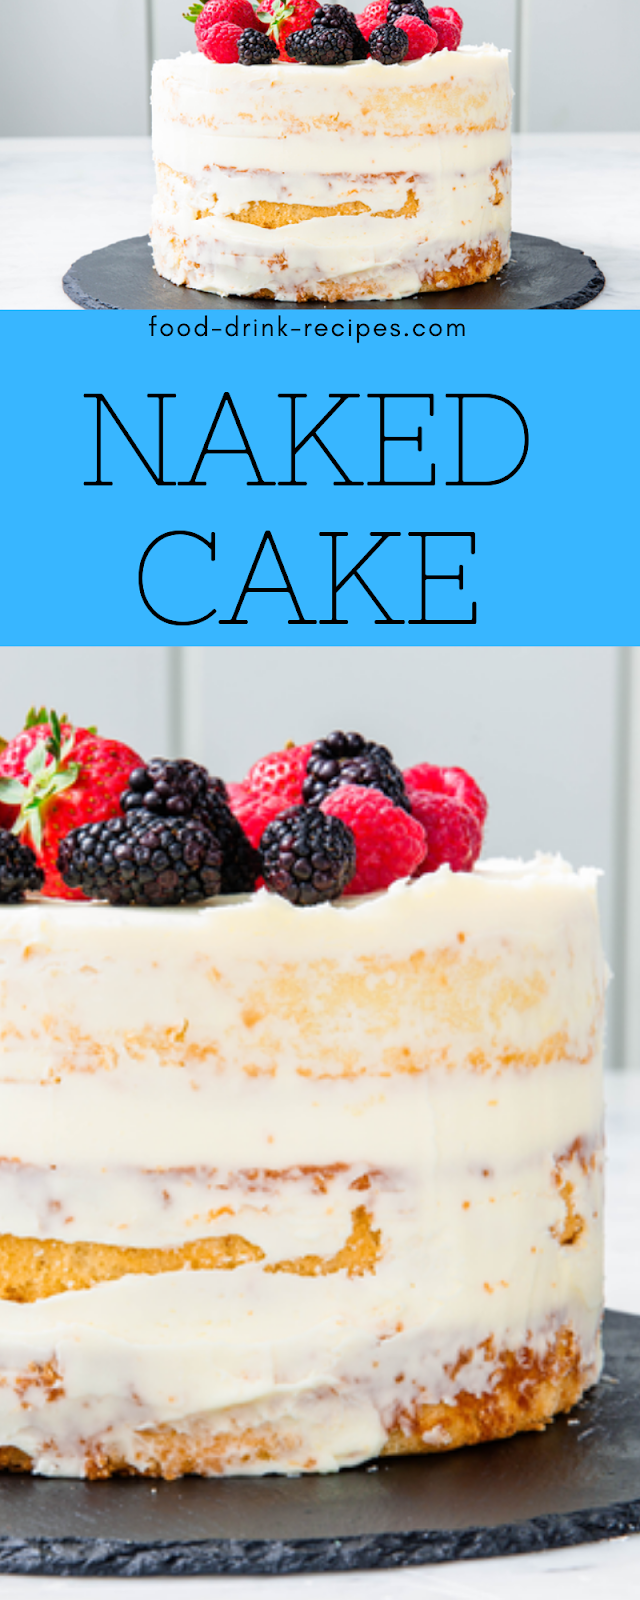 Naked Cake - food-drink-recipes.com